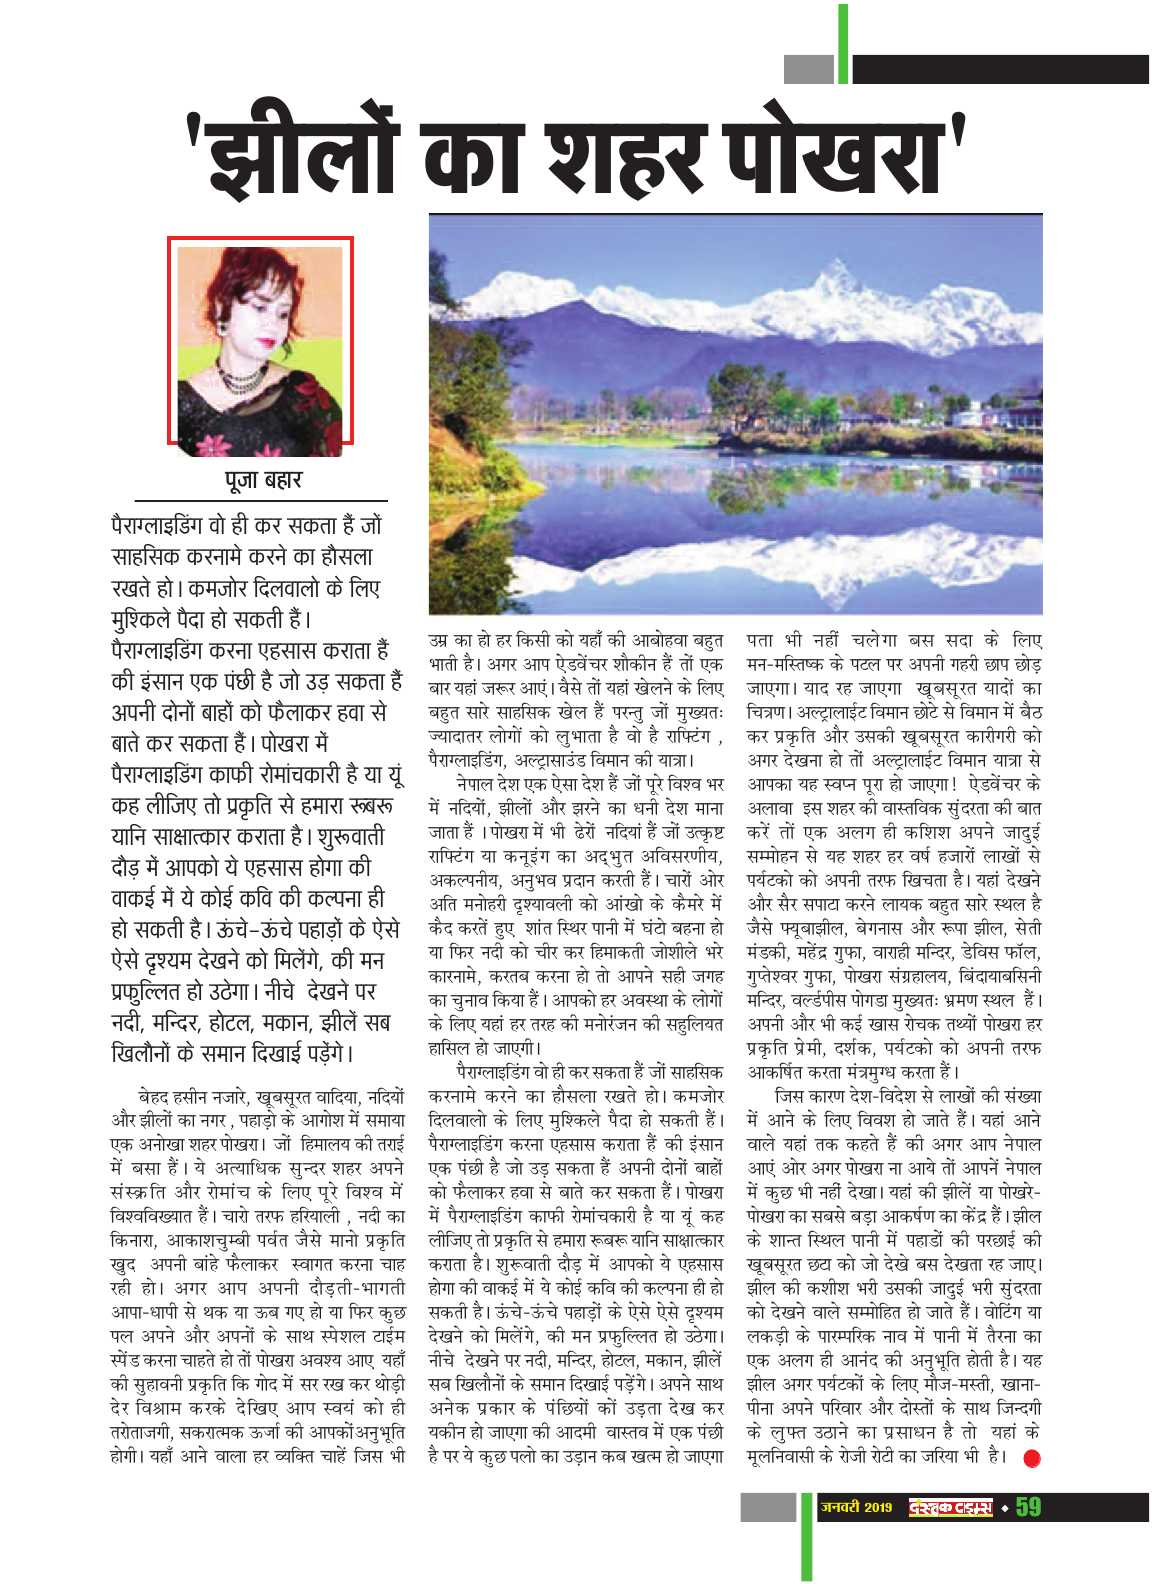 Dastak Times for E-Magazine 15 Jan 2019 new61